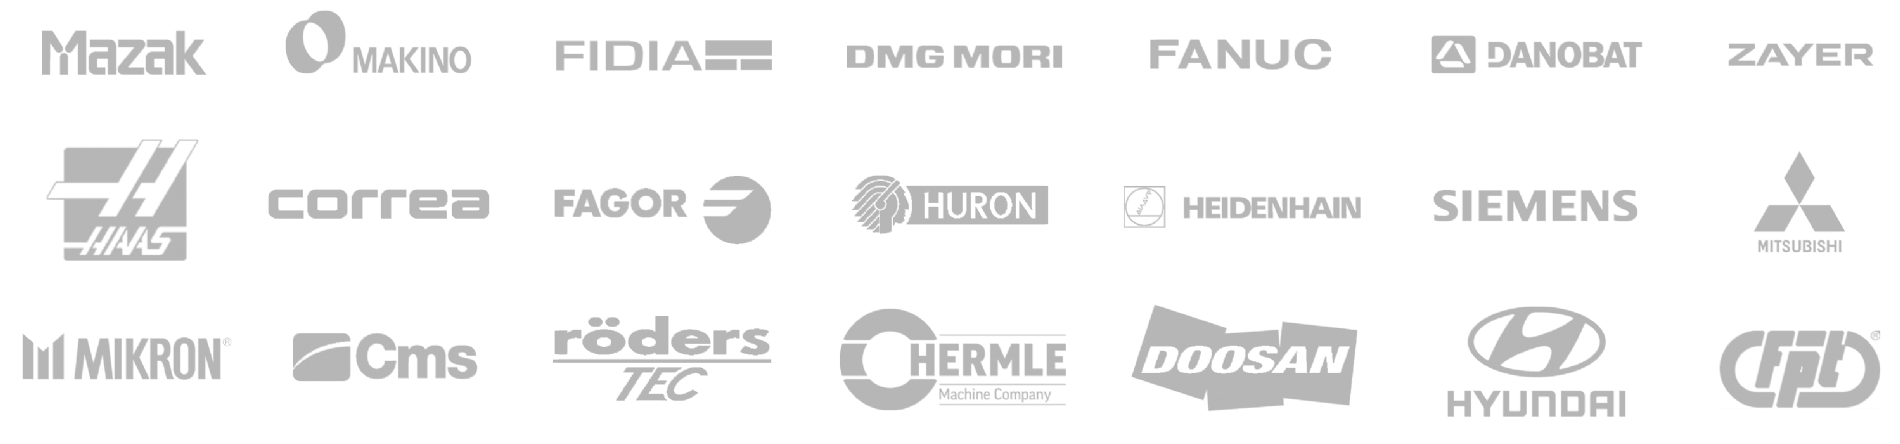 logos_fabricantes49568.png